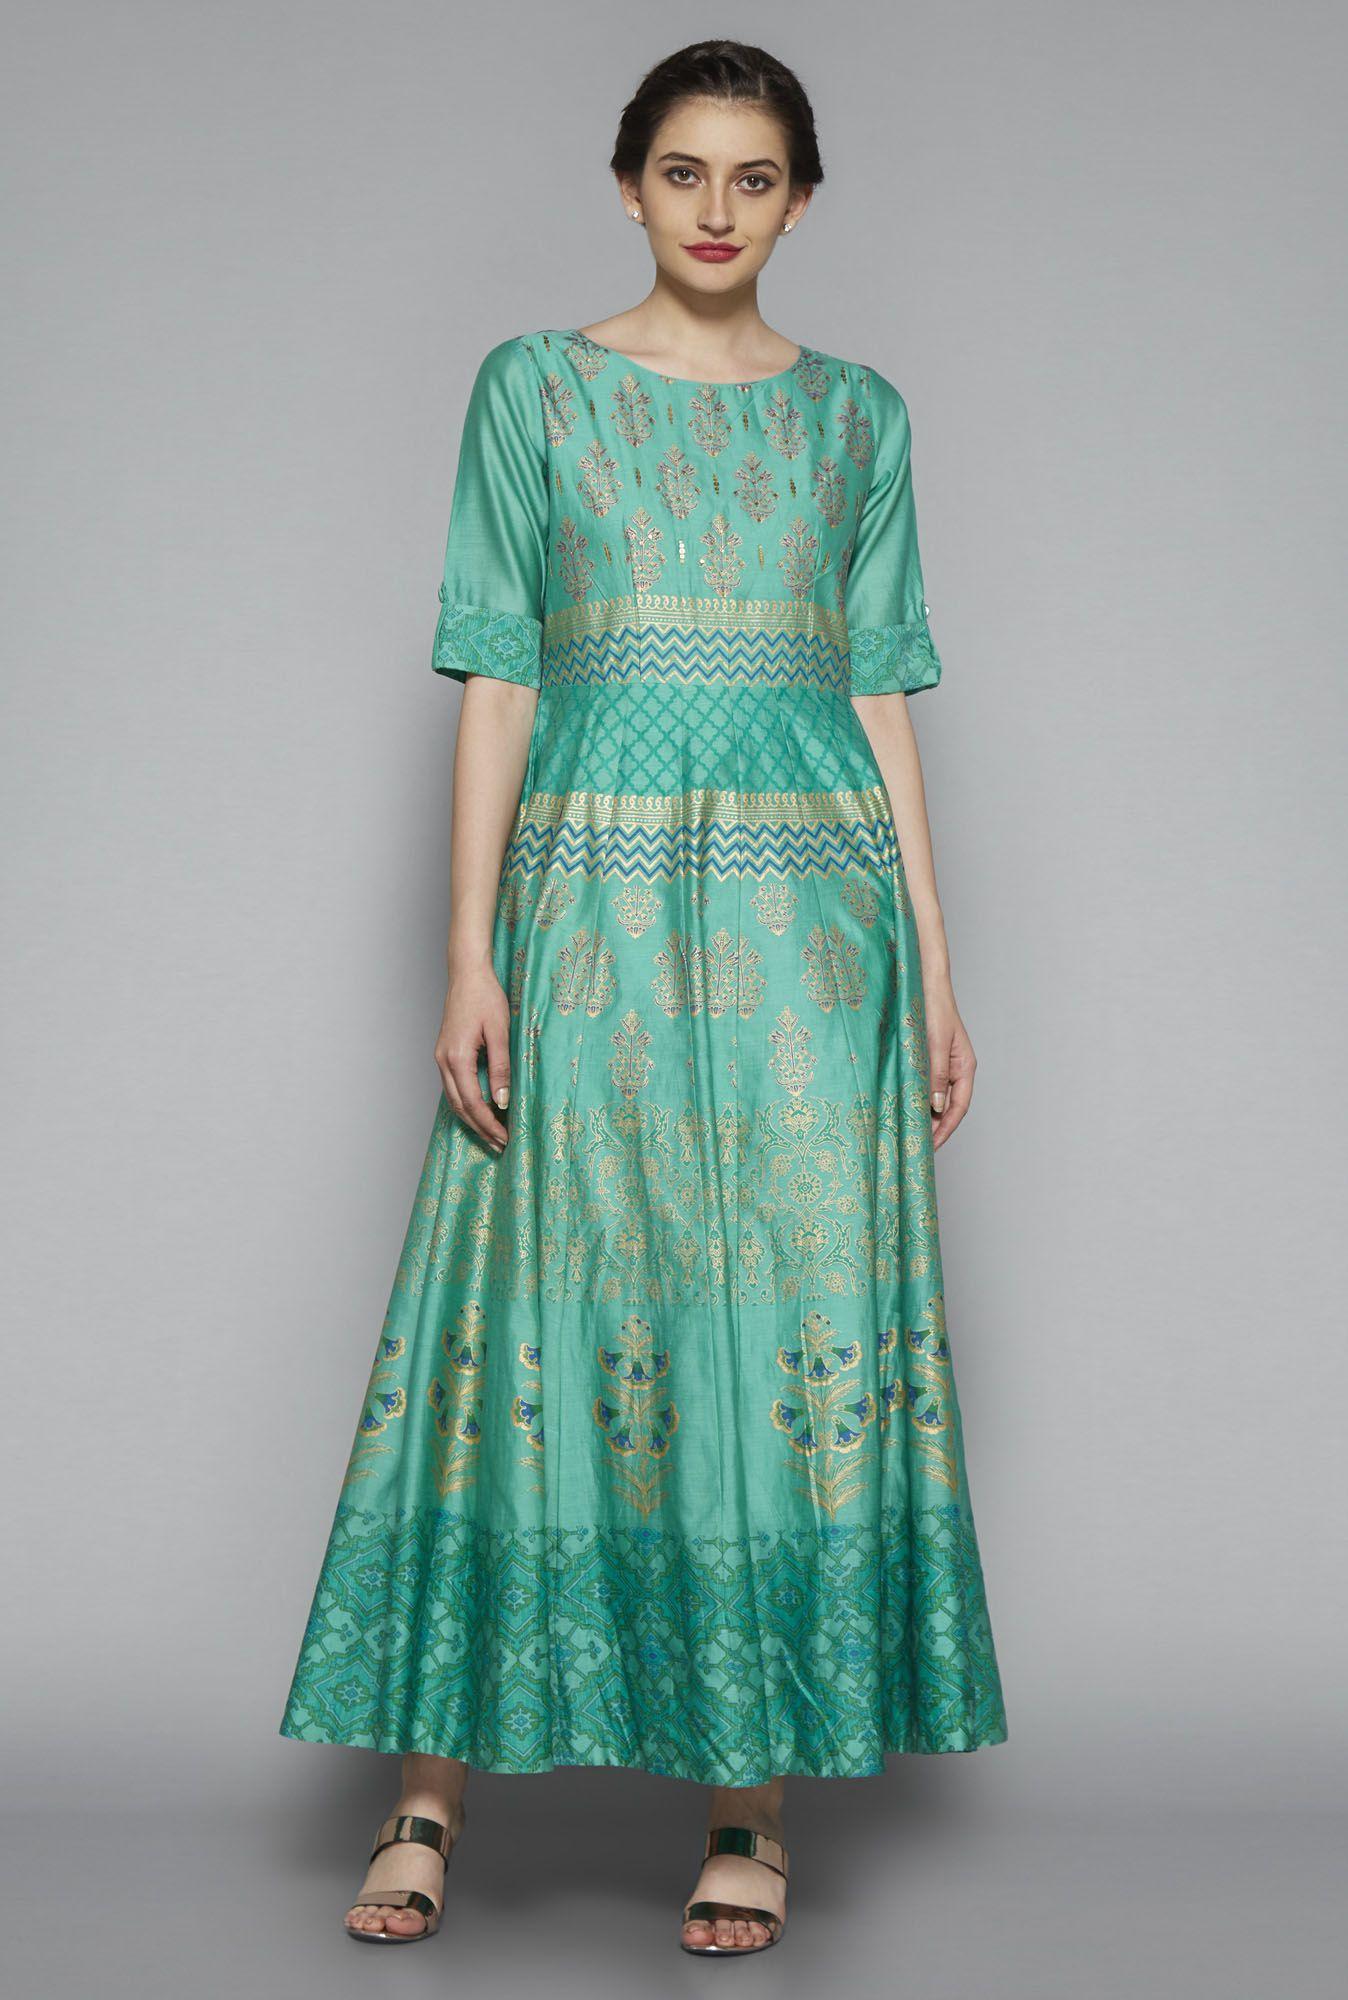 56153a8e2 ... Women Online @ Tata CLiQ. Vark by Westside Green Printed Dress